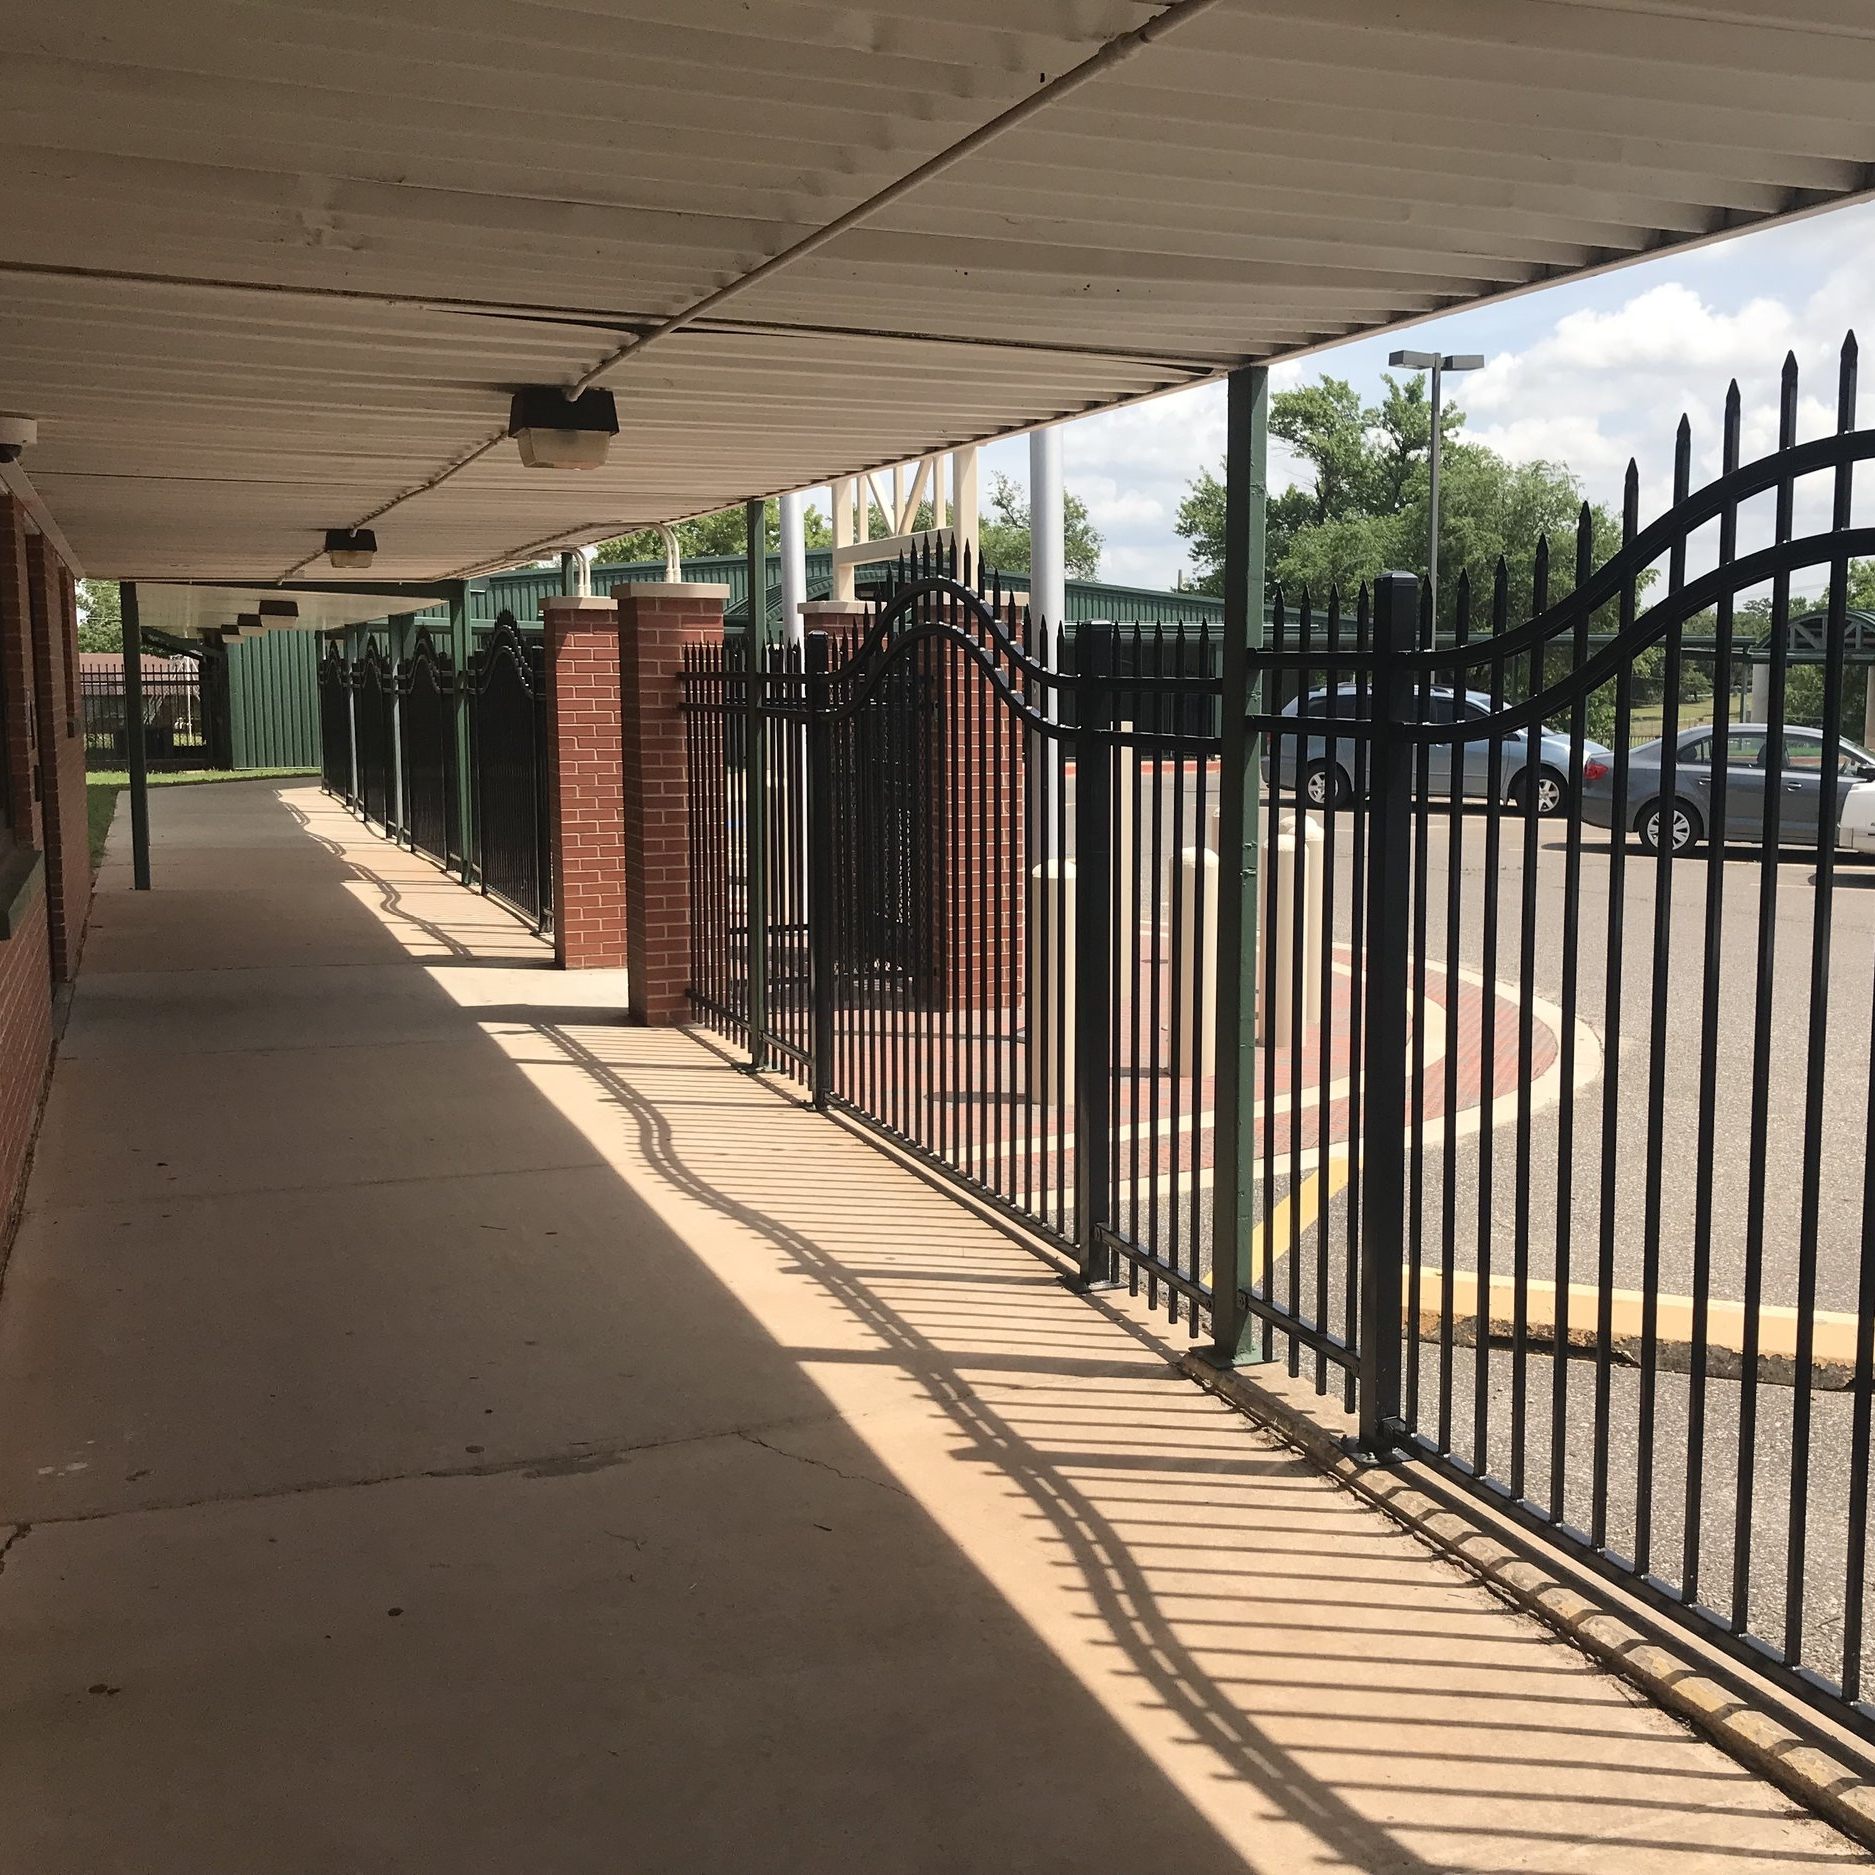 Fencing to secure pathway between buildings.